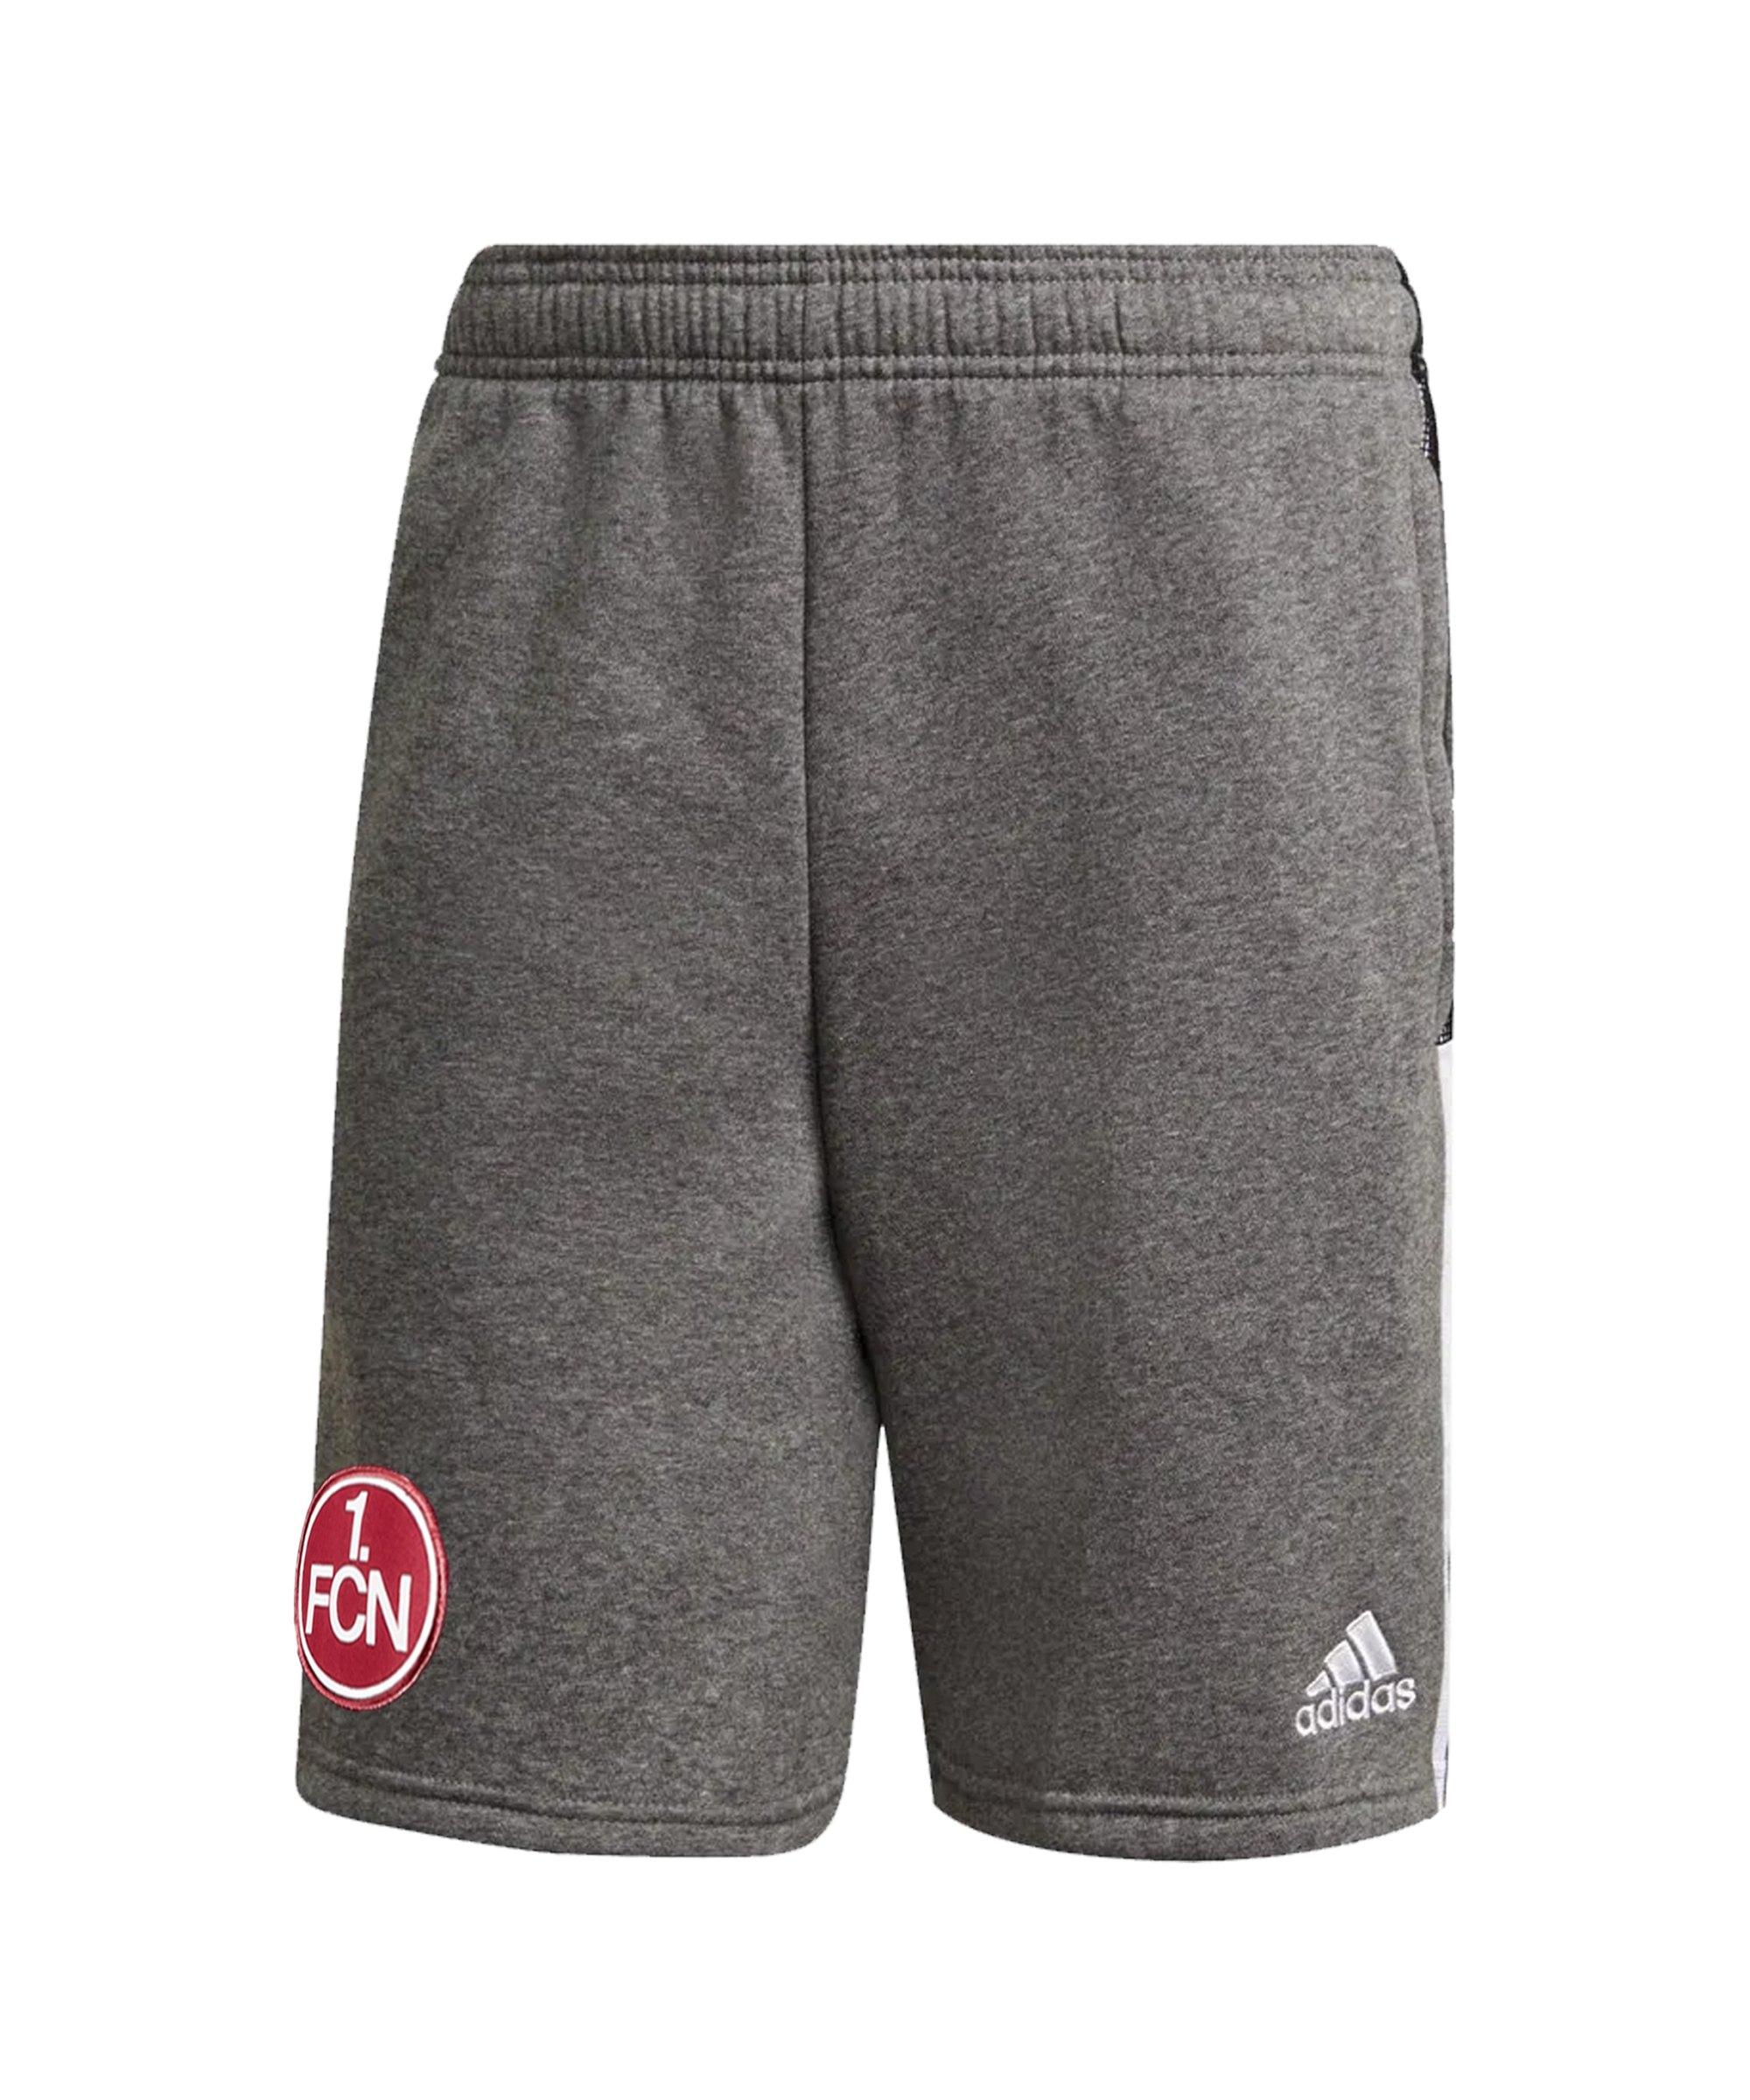 adidas 1. FC Nürnberg Short Grau - grau